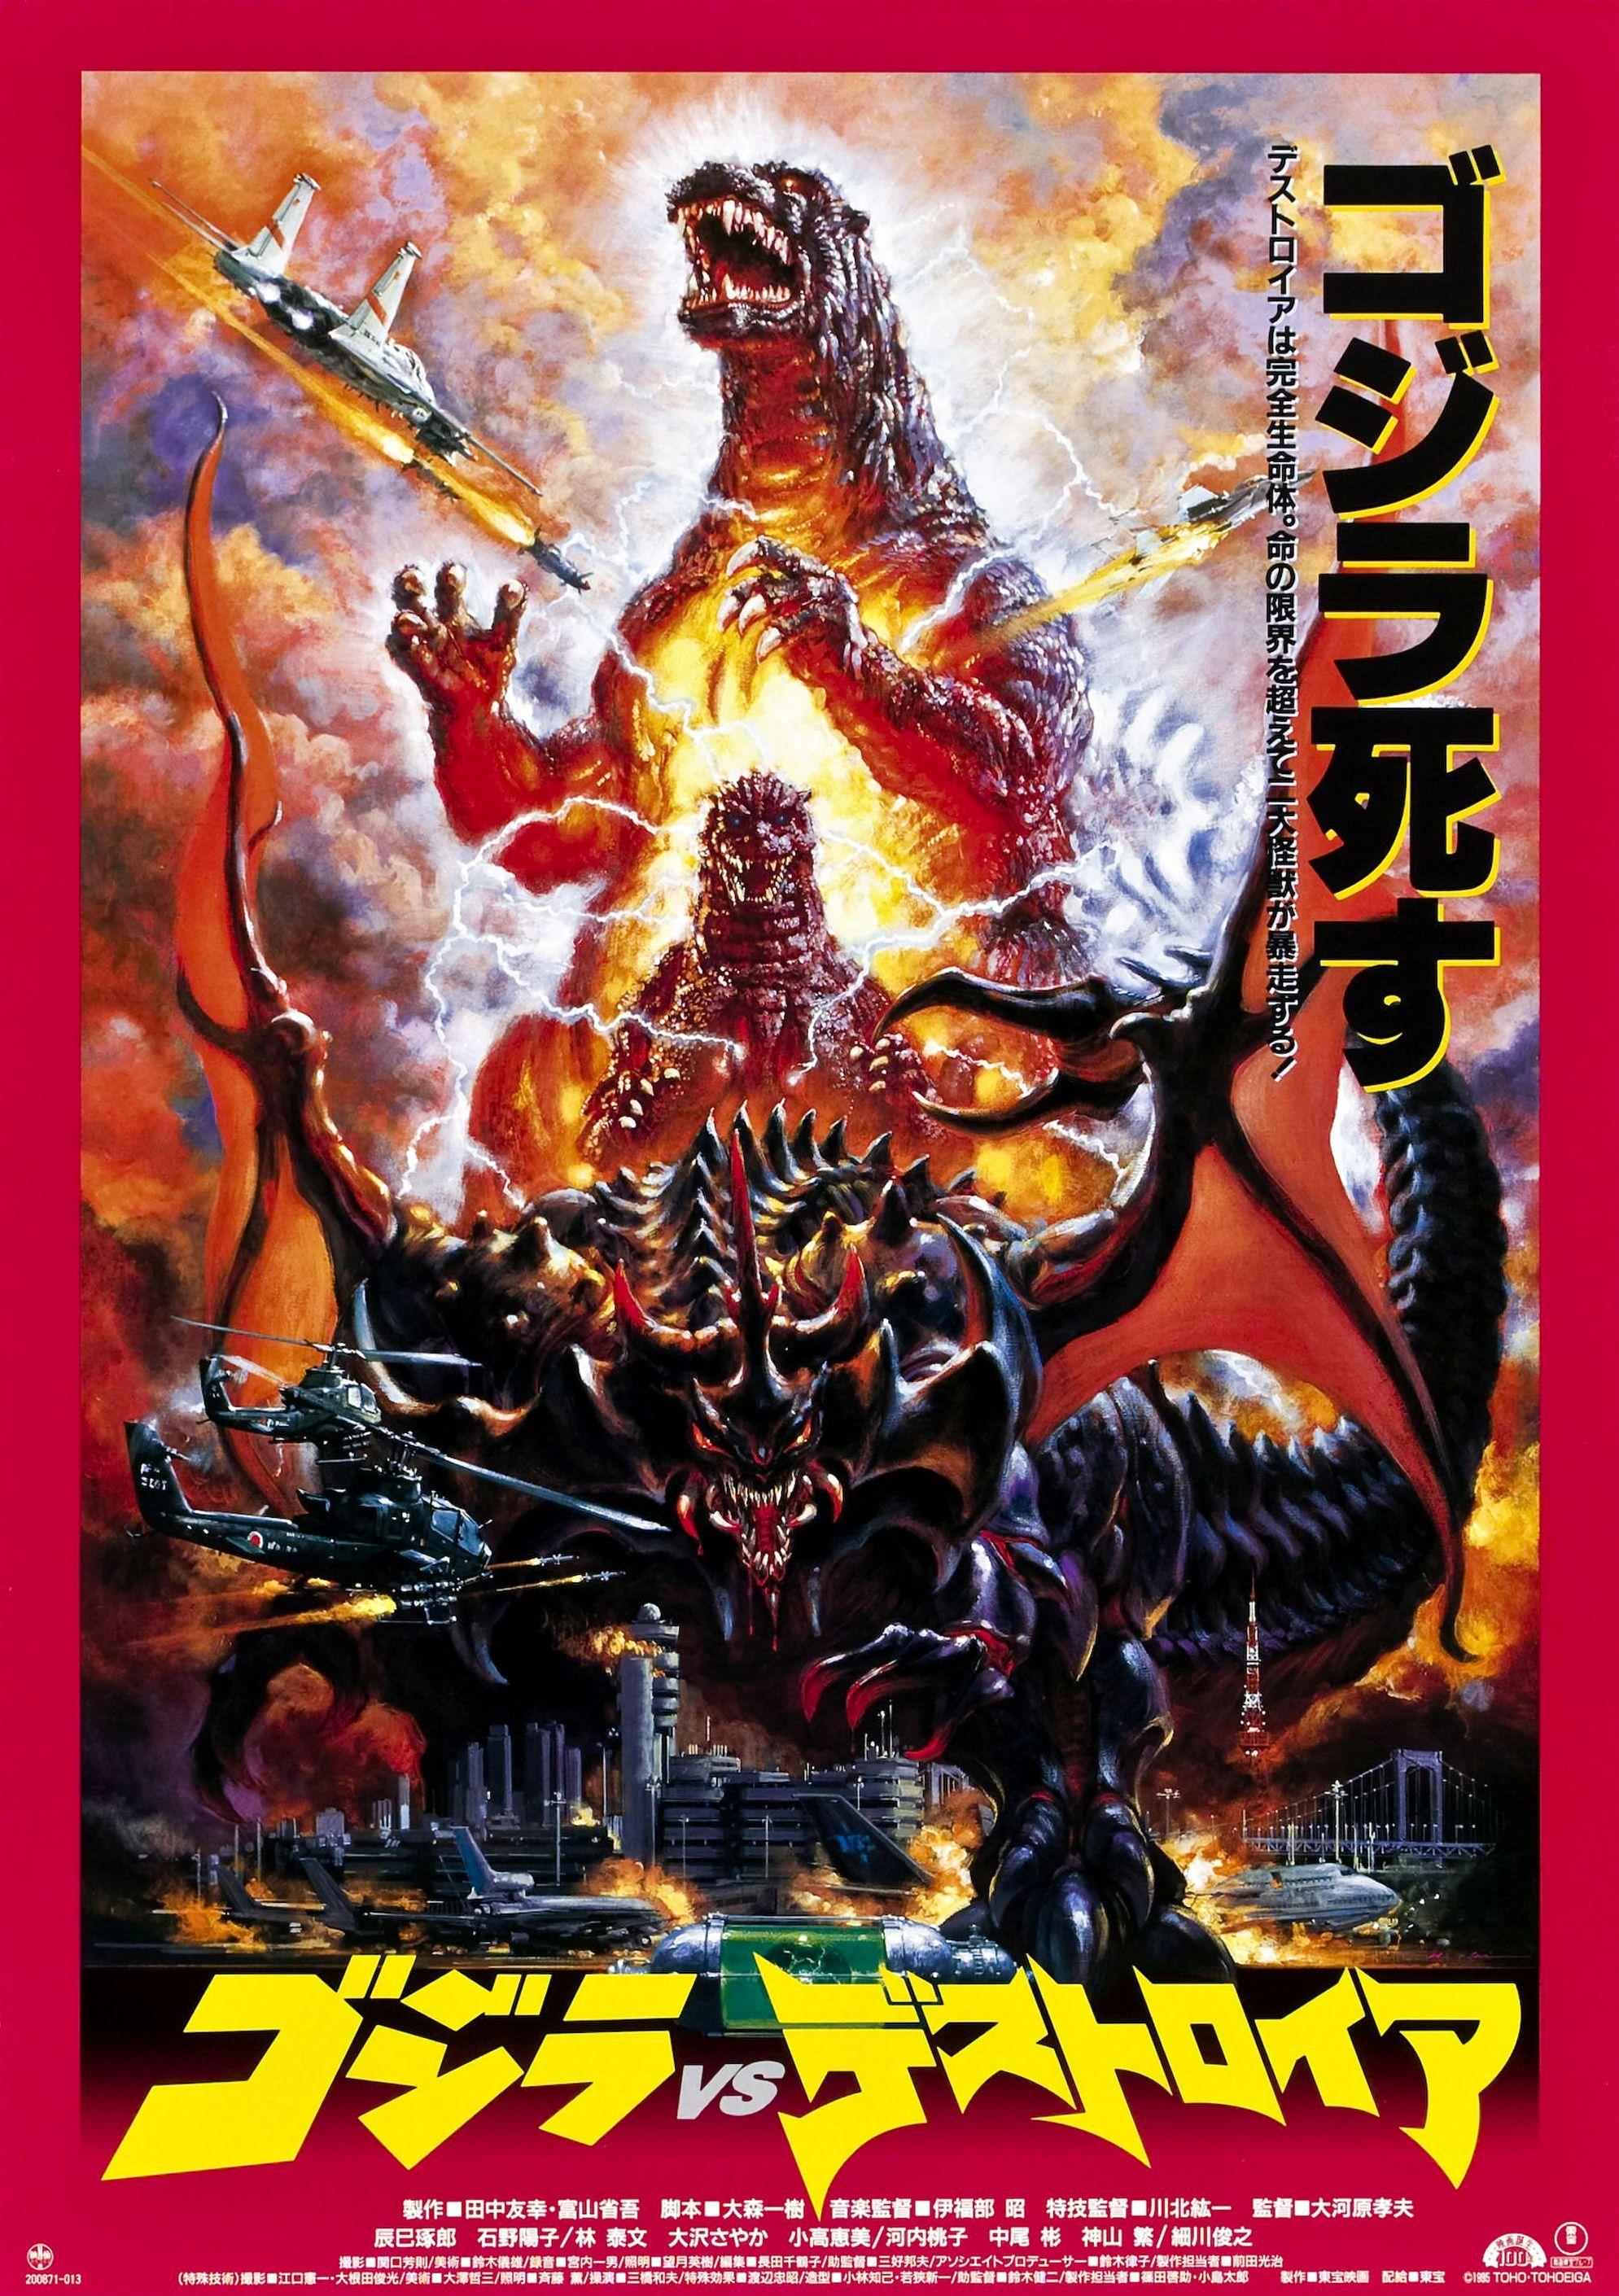 godzilla_vs_destoroyah_poster_1995_01.jpg